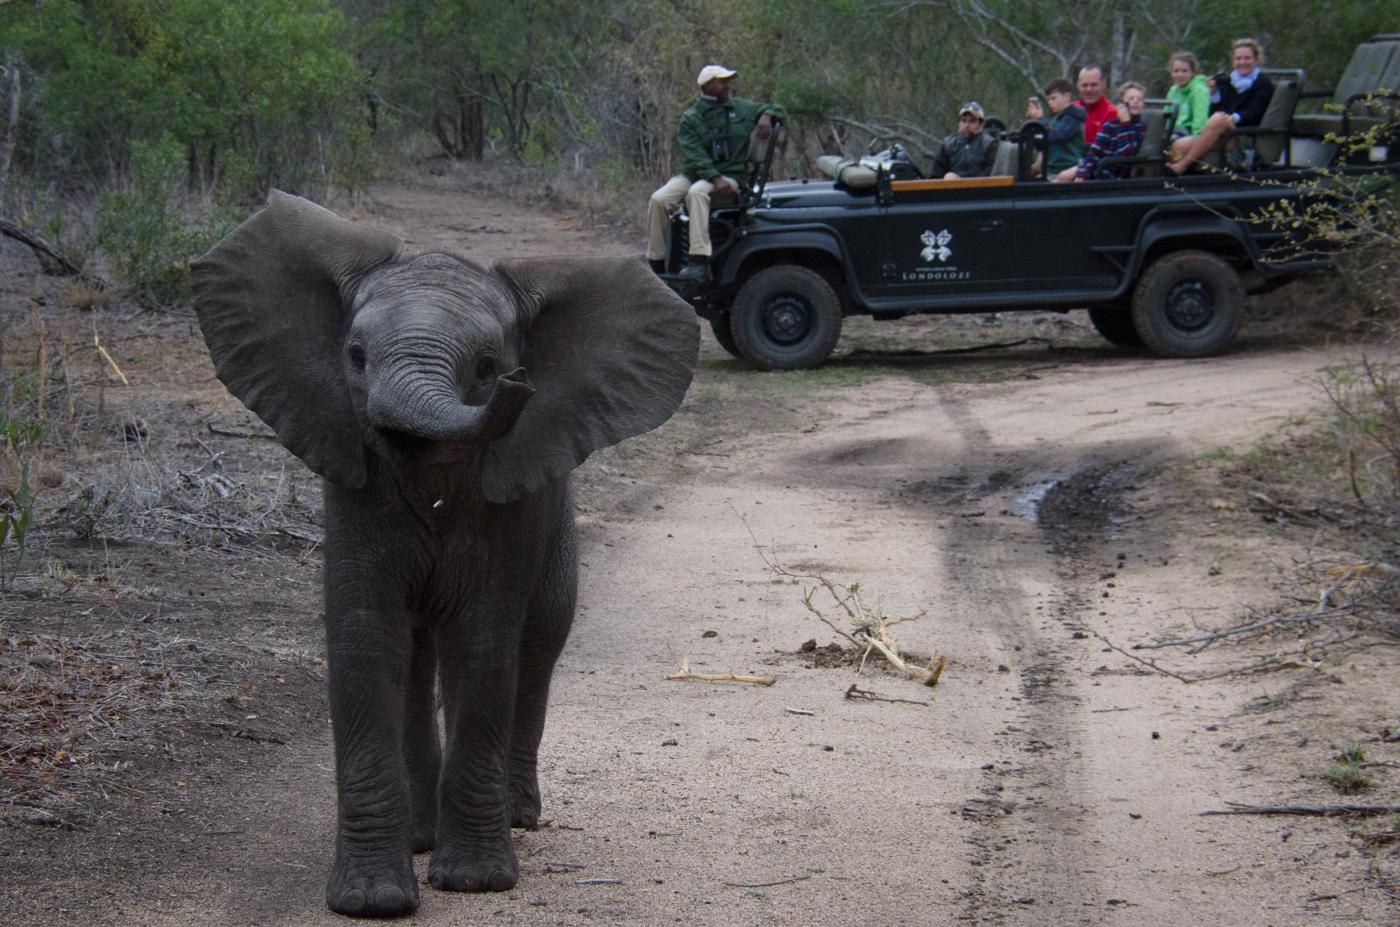 elephant-calf-charge-kp